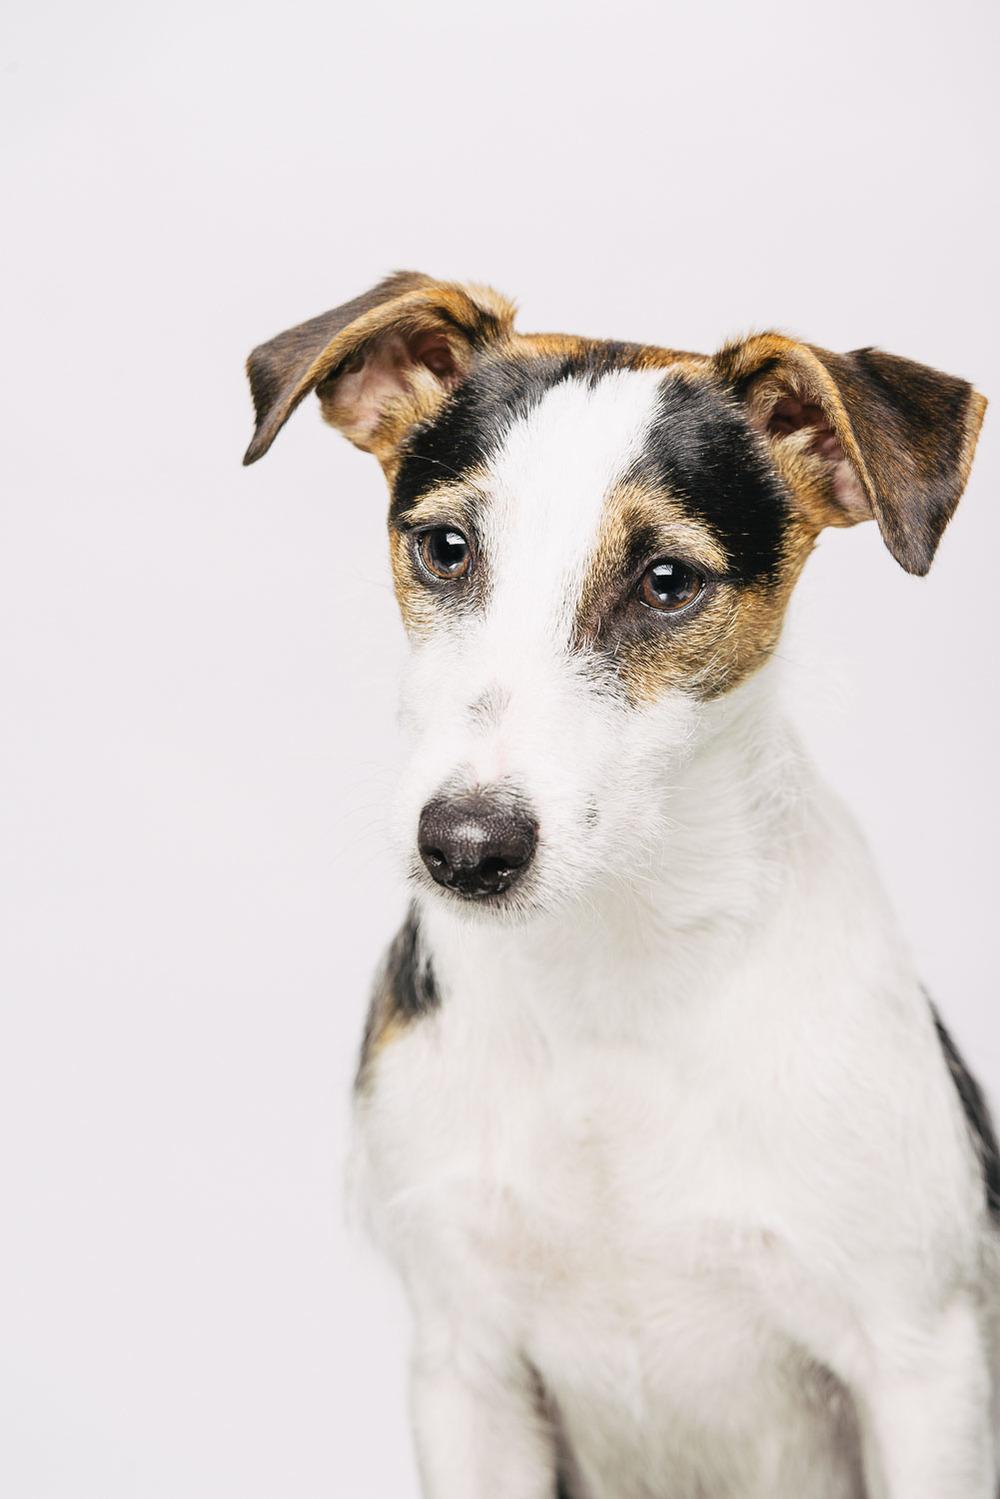 Pfotentick Hundefotografie Studio Shooting Luca Parson Russel Terrier